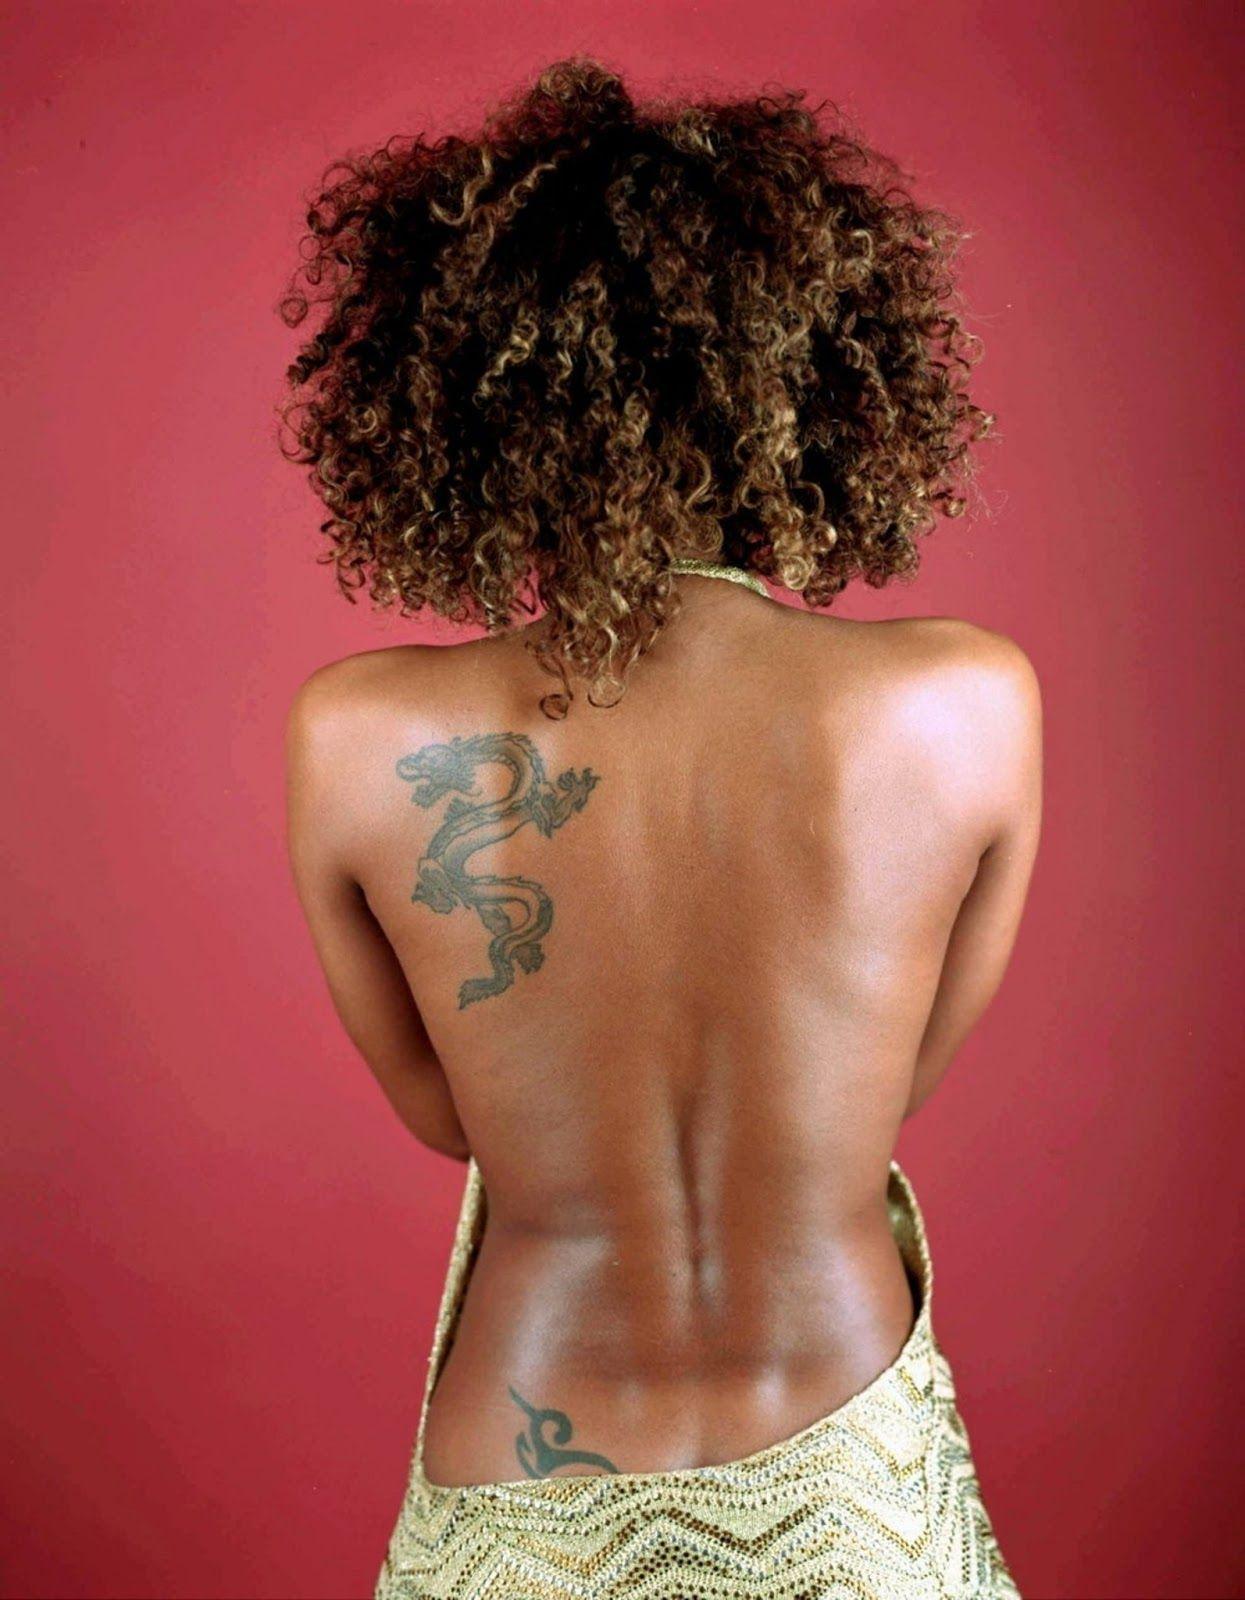 girl brown upskirt melanie Spice